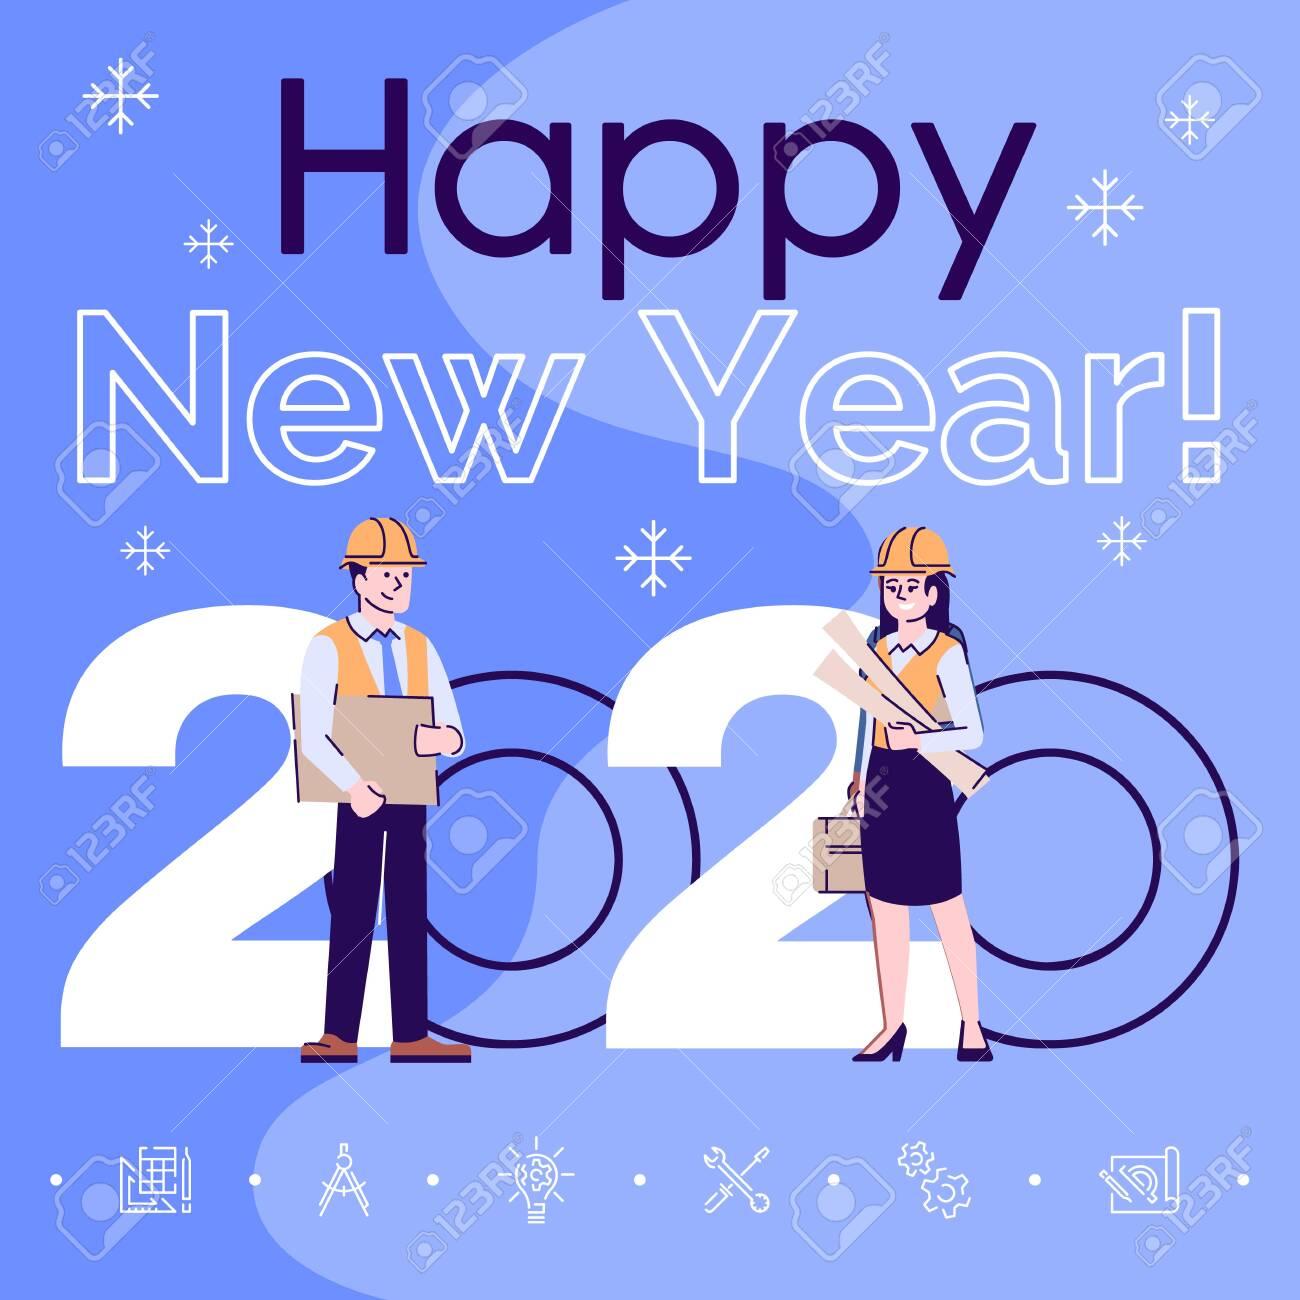 Profession Social Media Post Mockup Happy New Year 2020 Phrase Royalty Free Cliparts Vectors And Stock Illustration Image 137352435